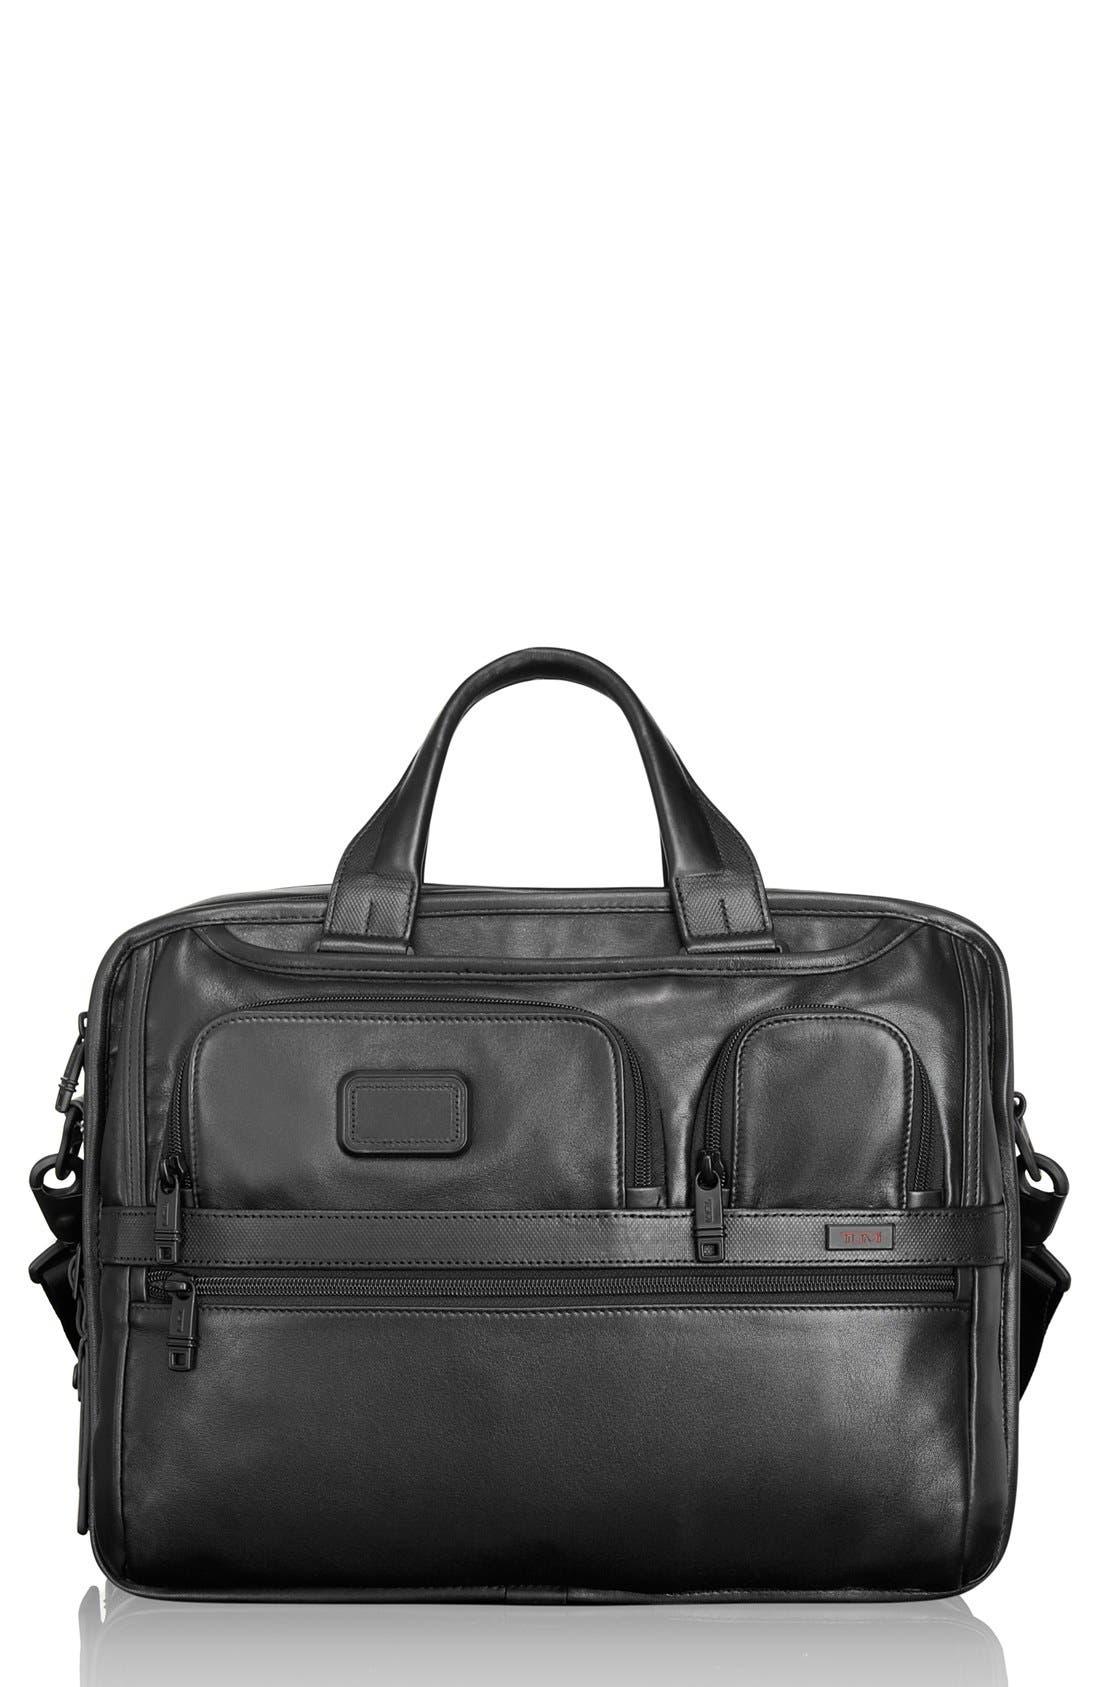 Main Image - Tumi 'Alpha 2' Expandable Laptop Briefcase